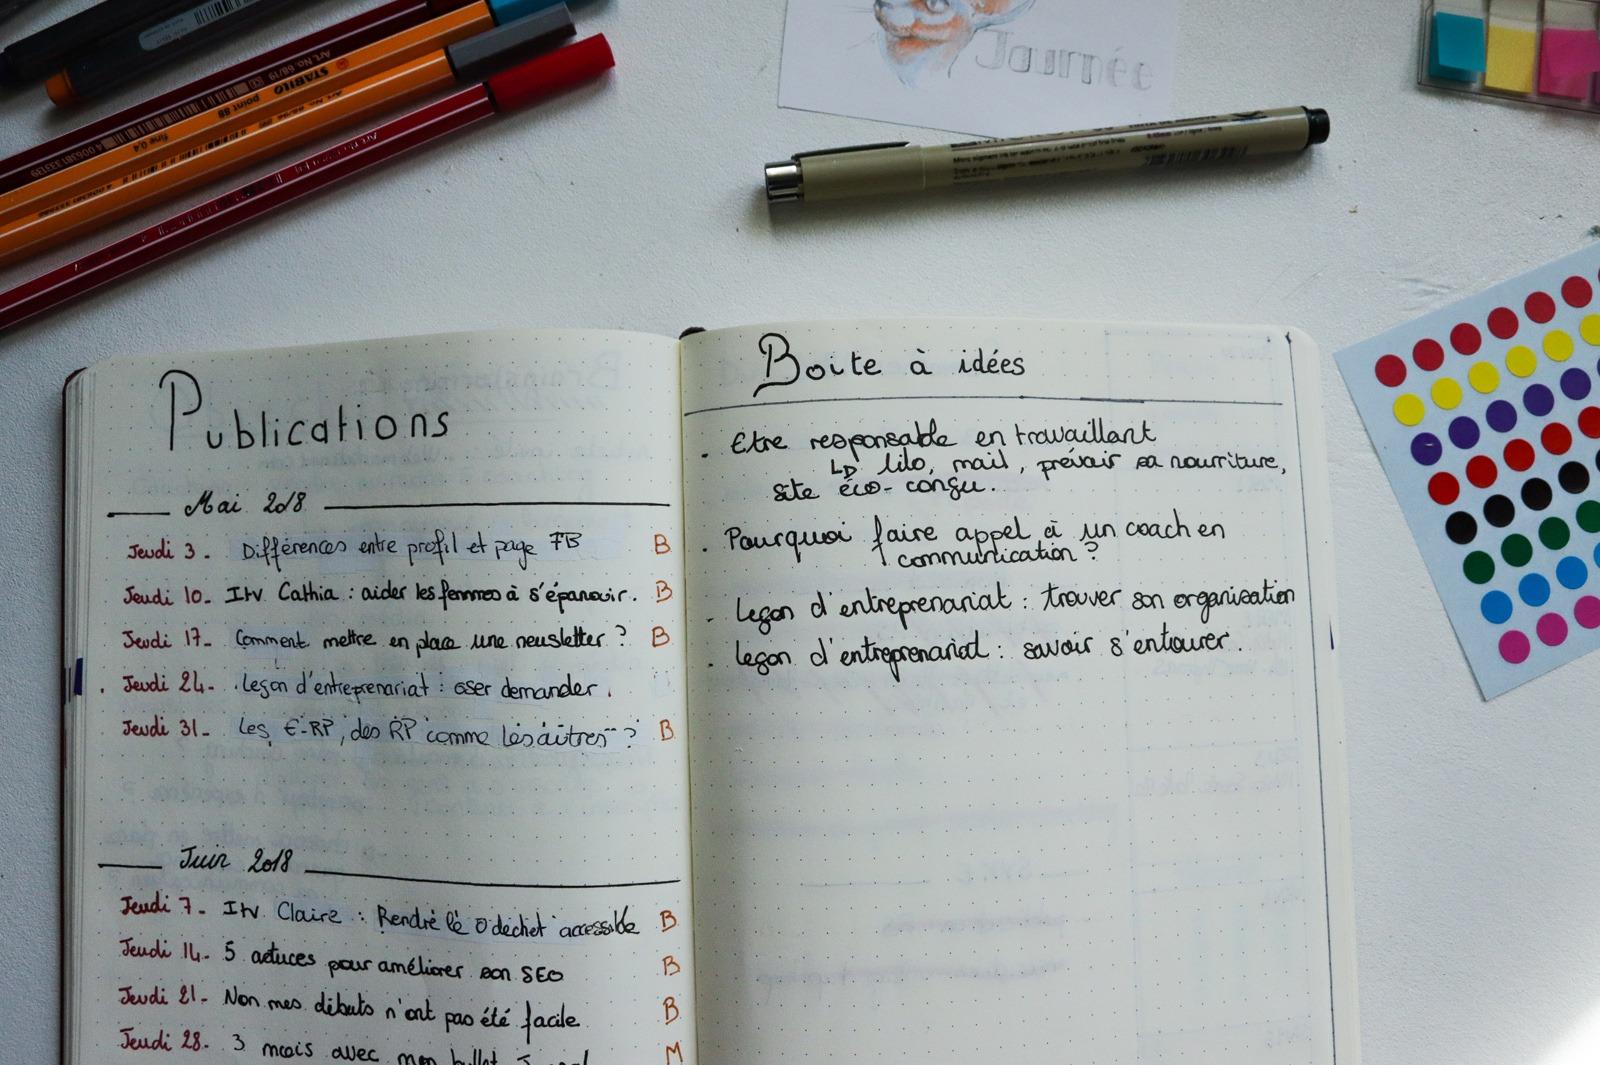 bullet-journal-publication